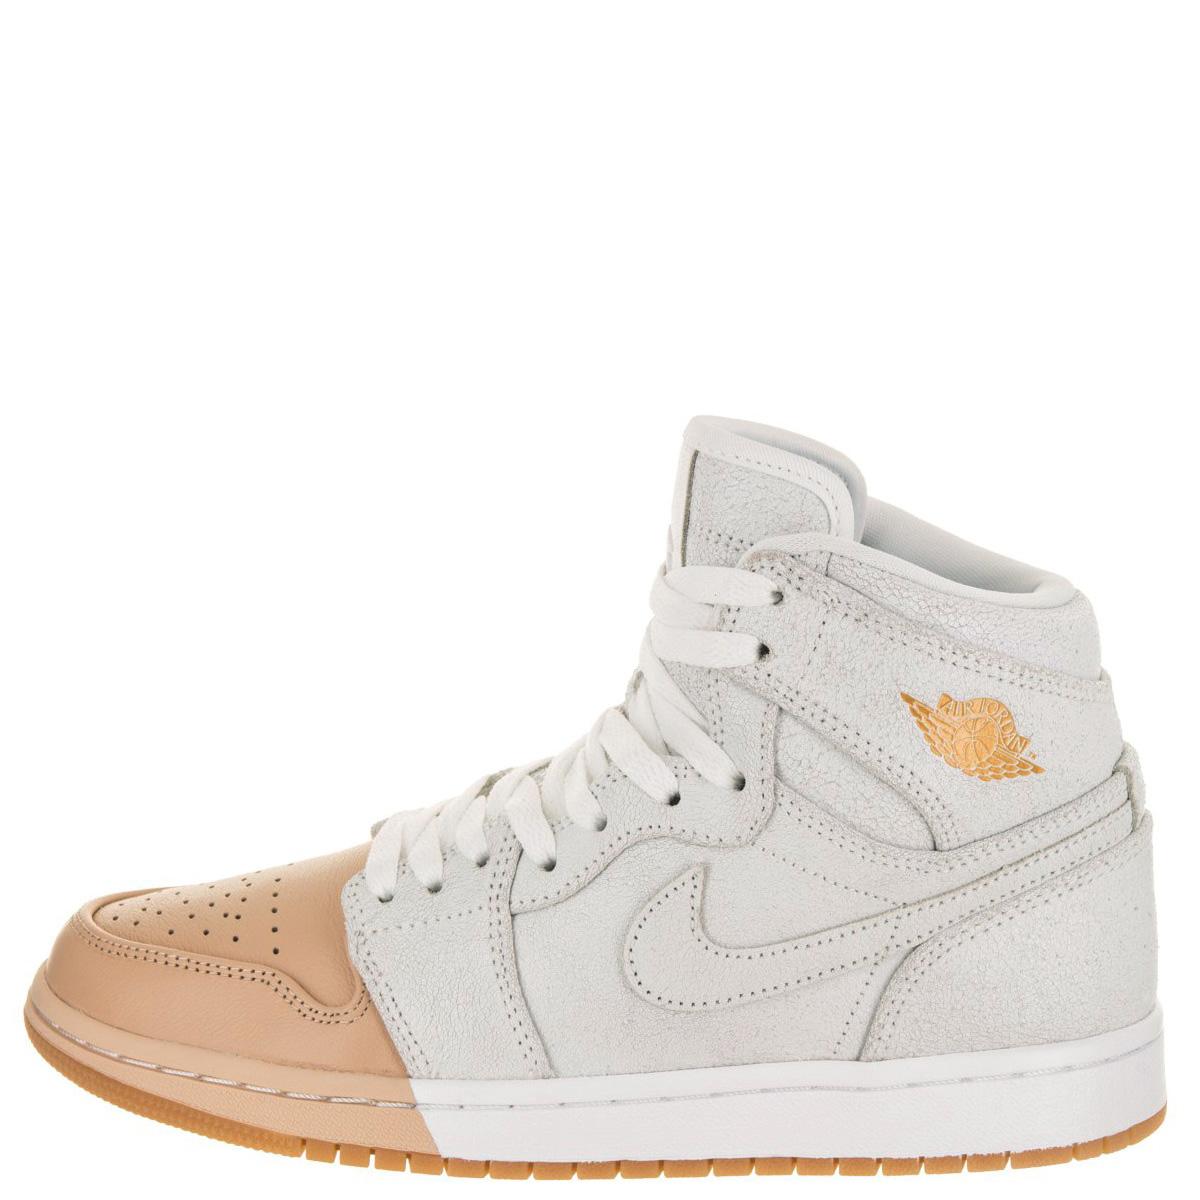 detailed look 25082 92c04 ALLSPORTS Nike NIKE Air Jordan 1 nostalgic high sneakers Ladys WMNS AIR  JORDAN 1 RETRO HIGH white AH7389-107 221 Shinnyu load 192  Rakuten  Global ...